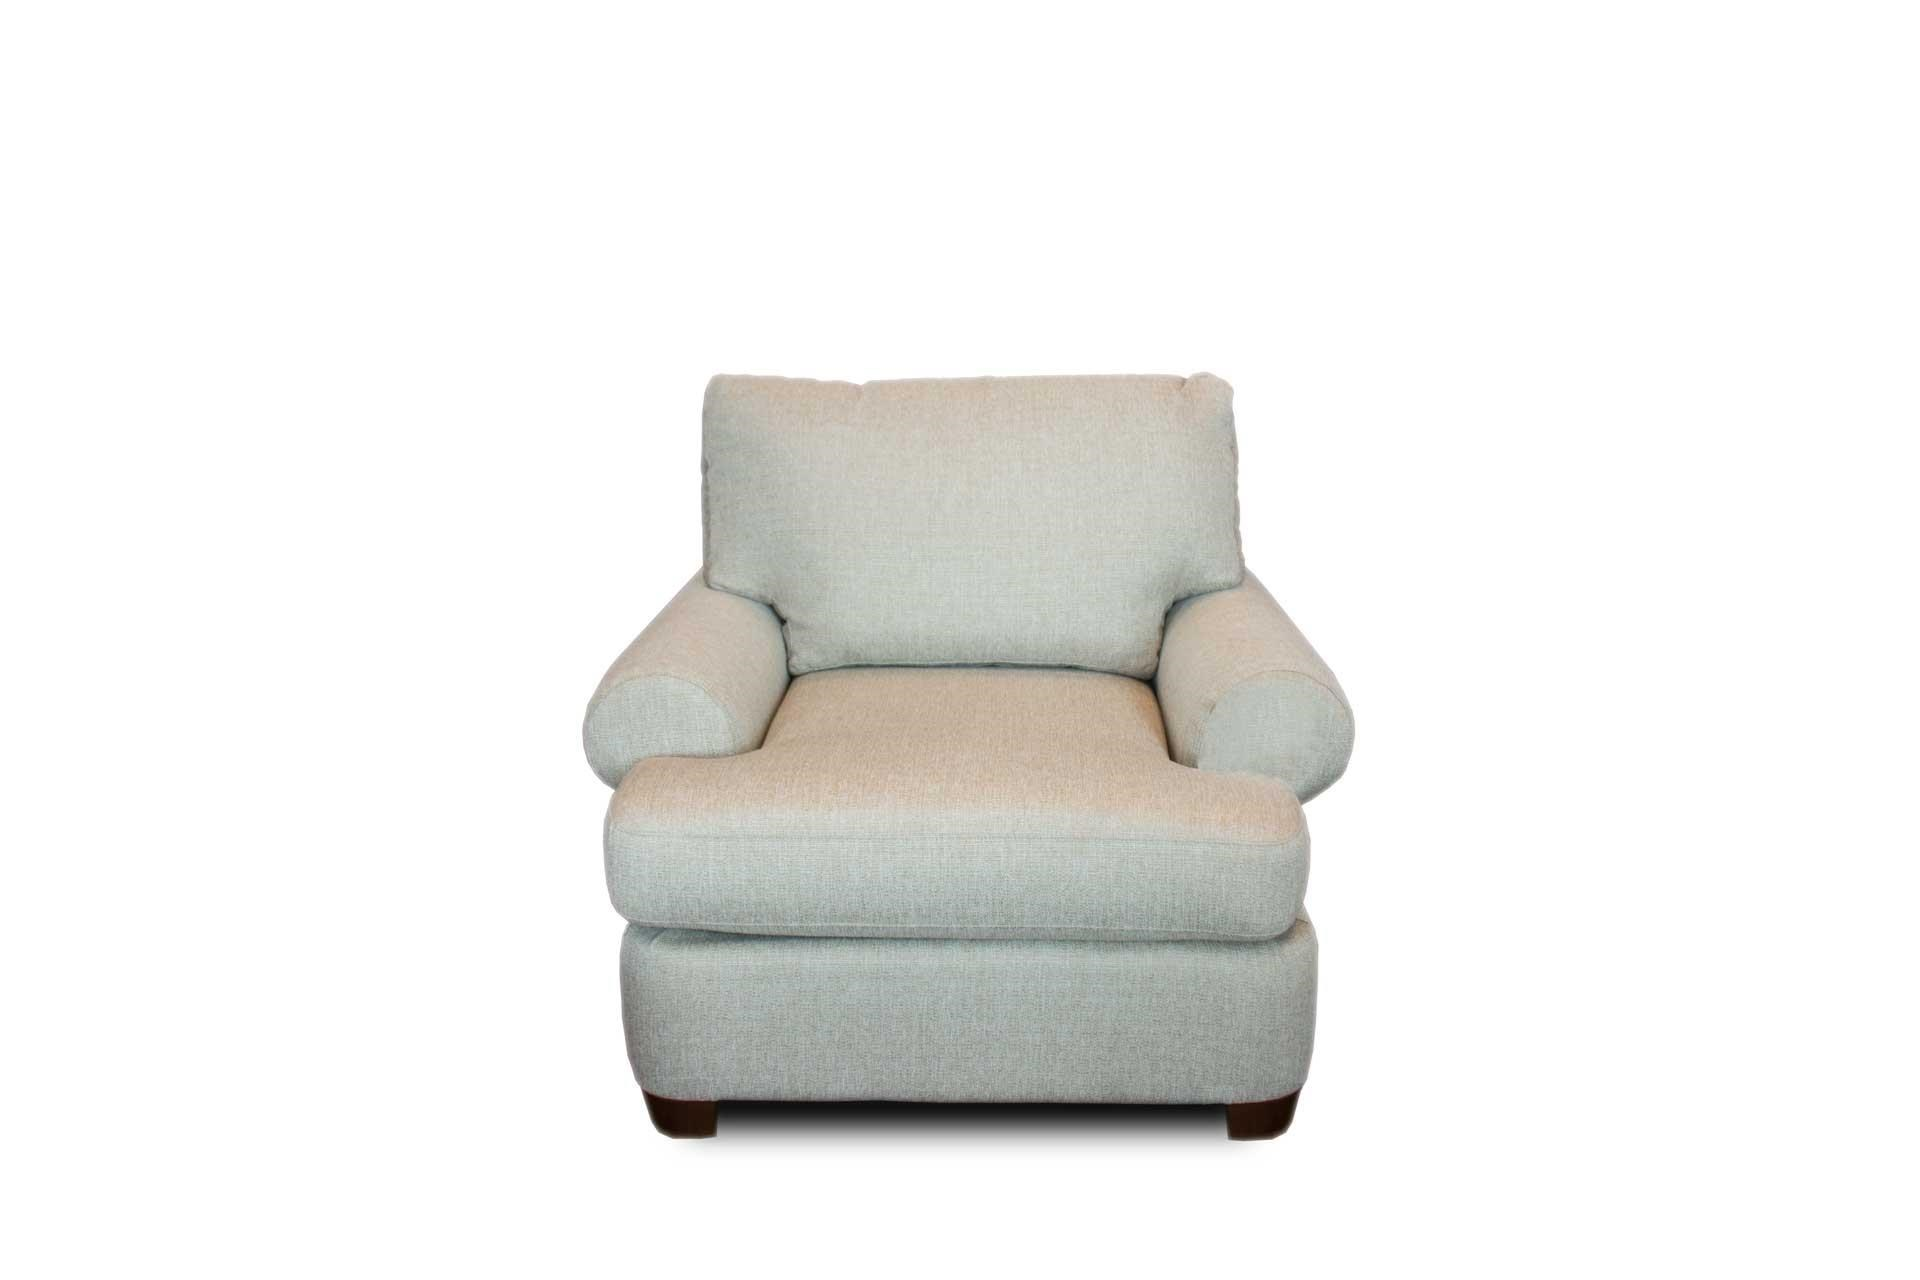 Bassett Monterey Chair - Item Number: 3901-12FC-FC1520-1